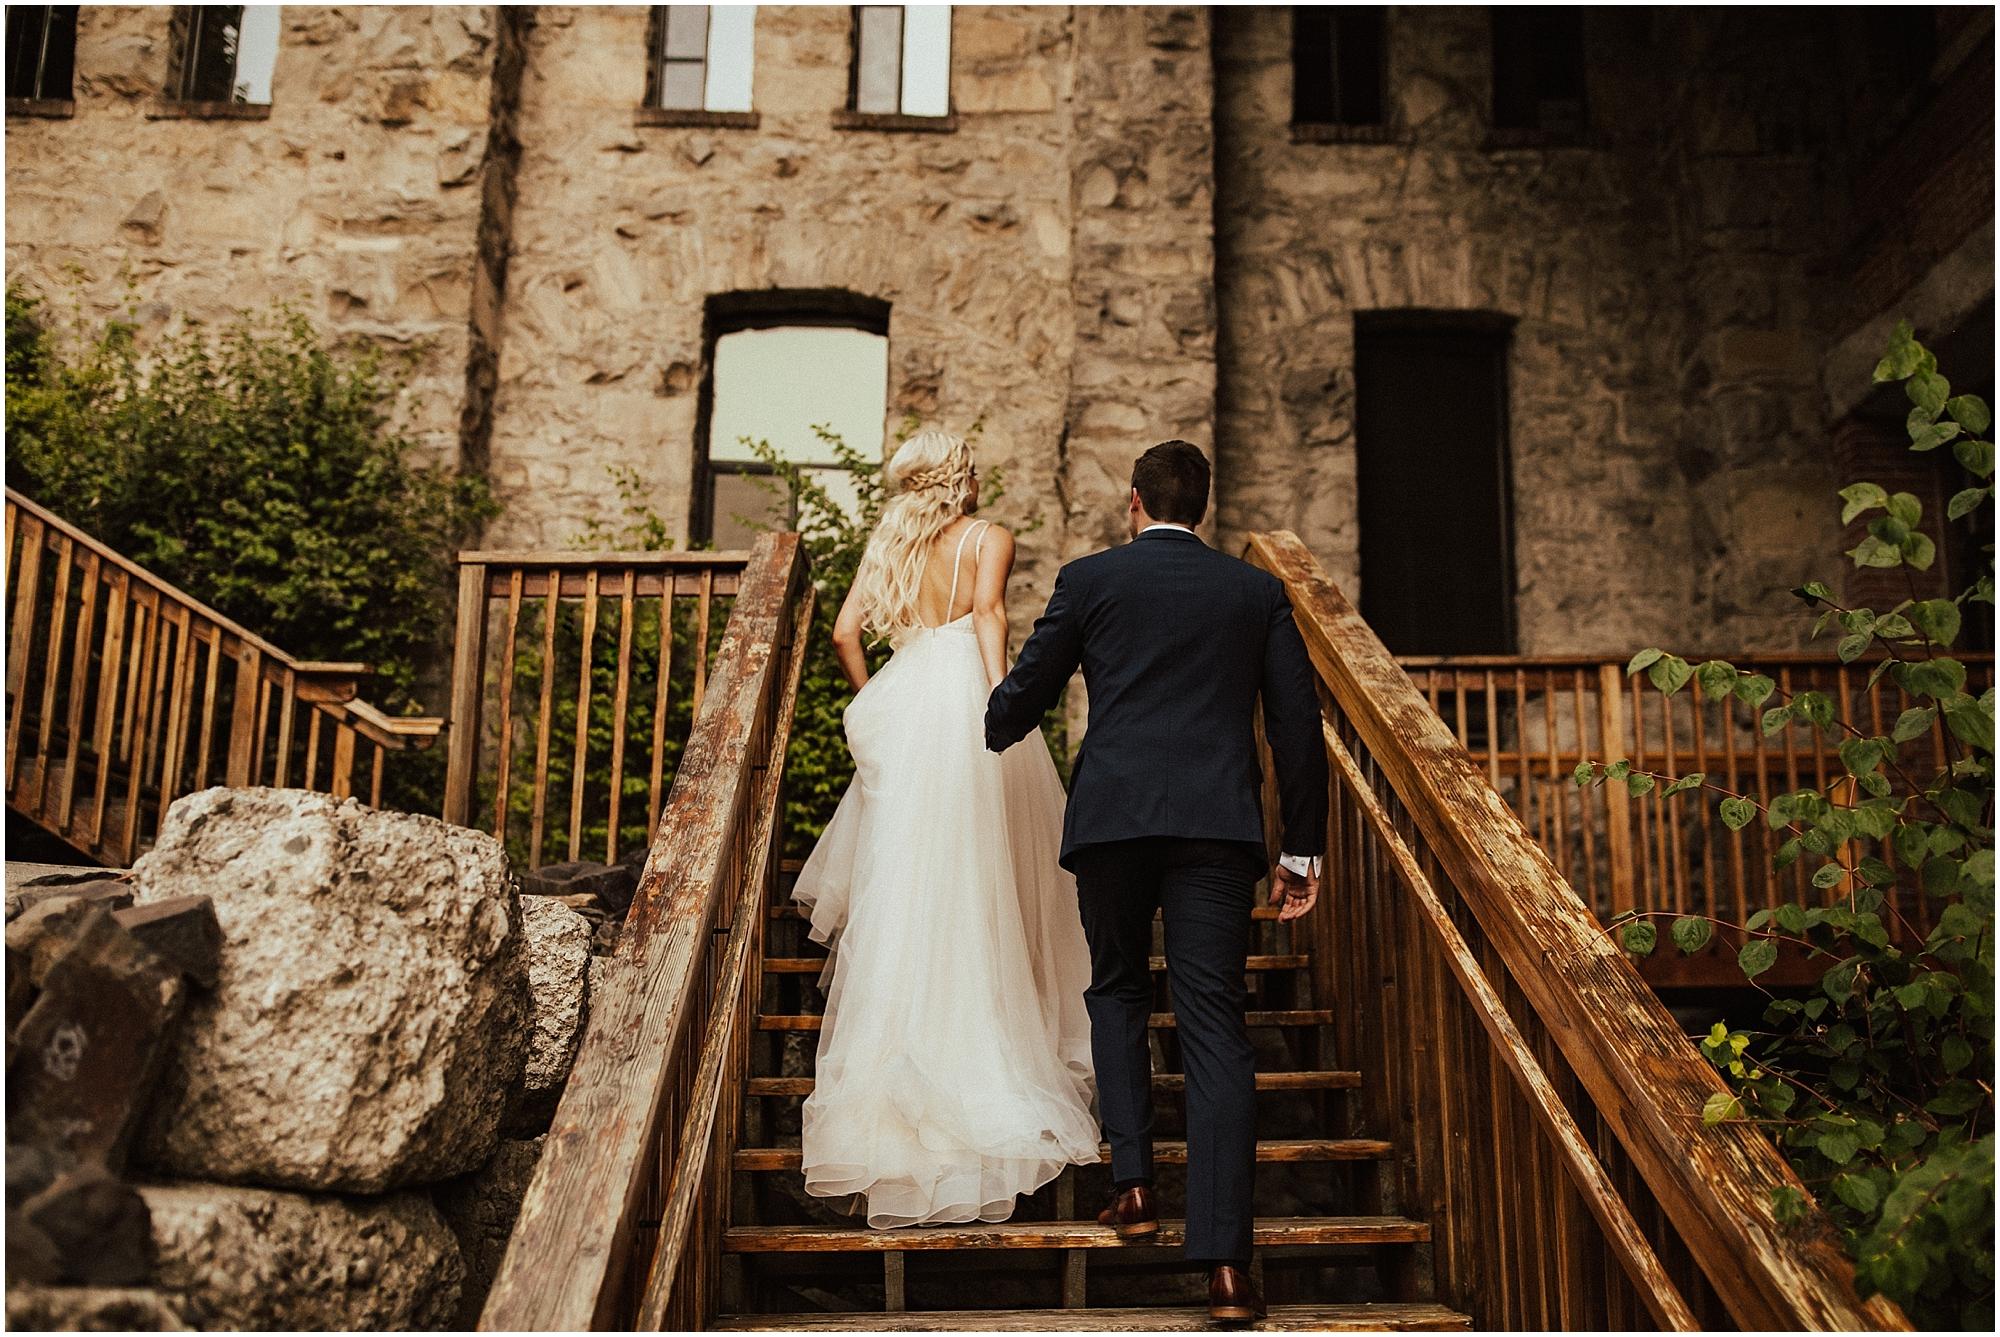 Chateau Rive Spokane Wedding Cassie Trottier Photography1124.jpg